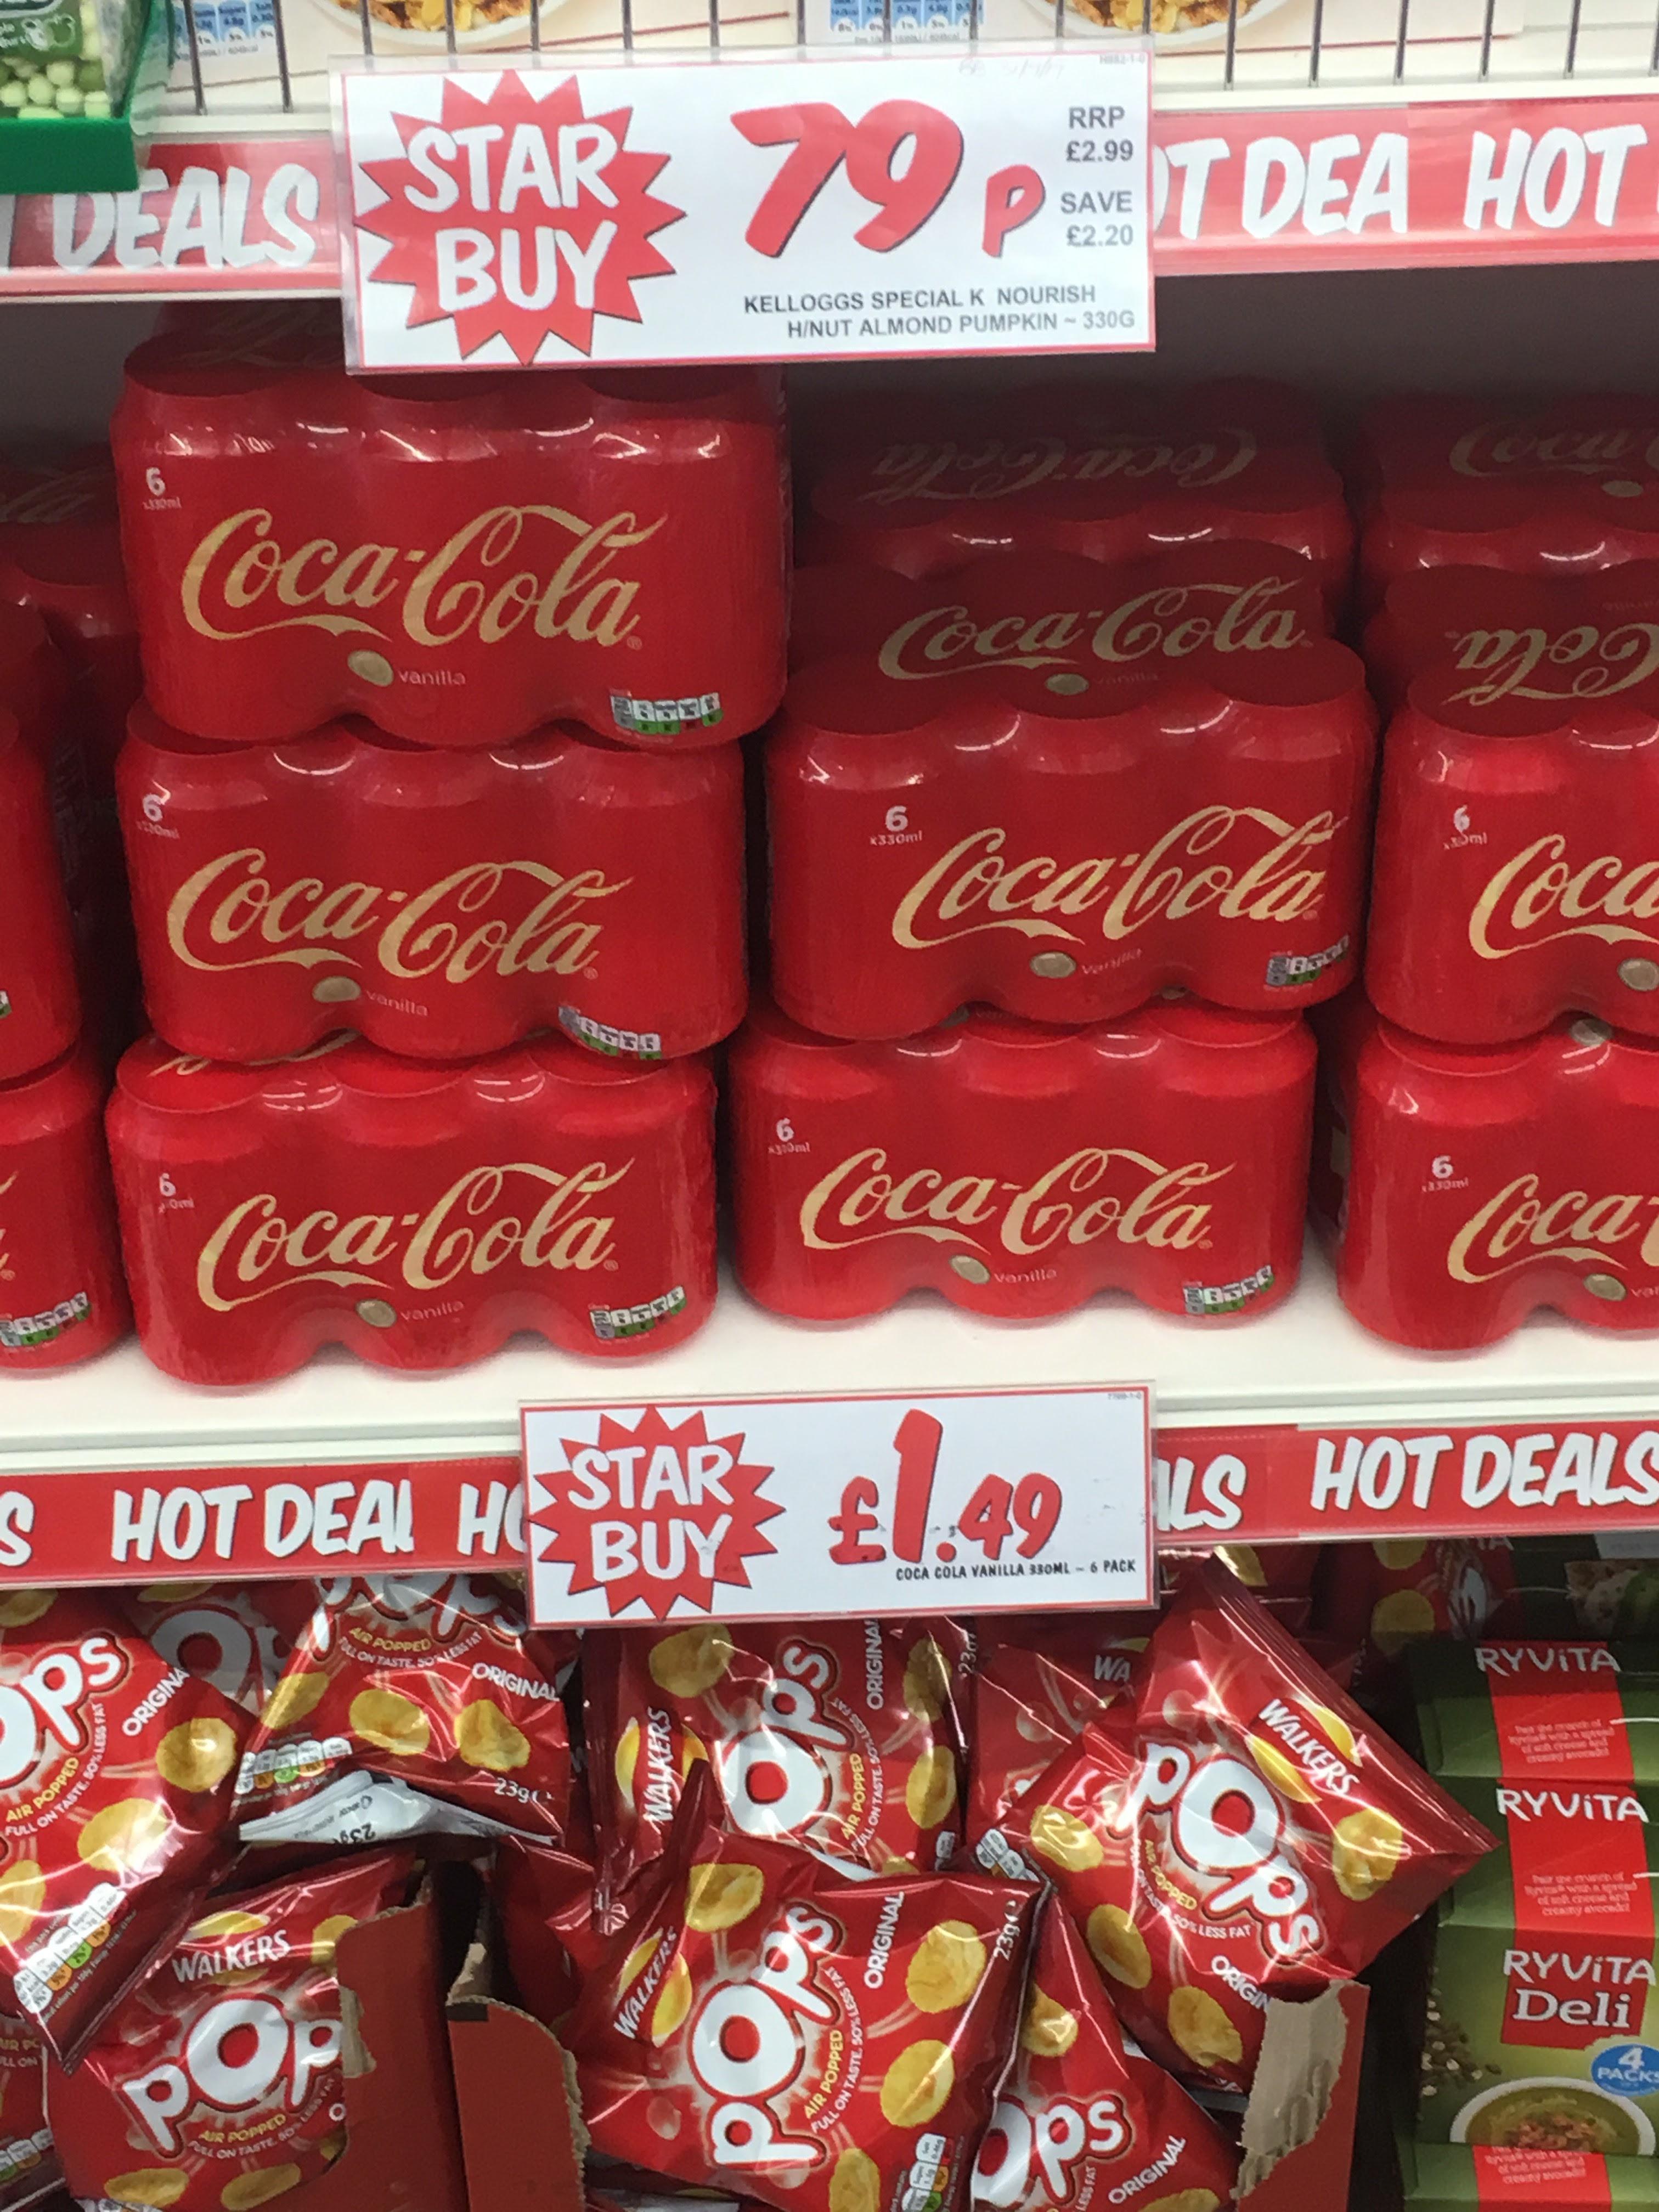 Vanilla Coke 6x330ml cans £1.49 @ Fulton's, Tunstall Road Leeds